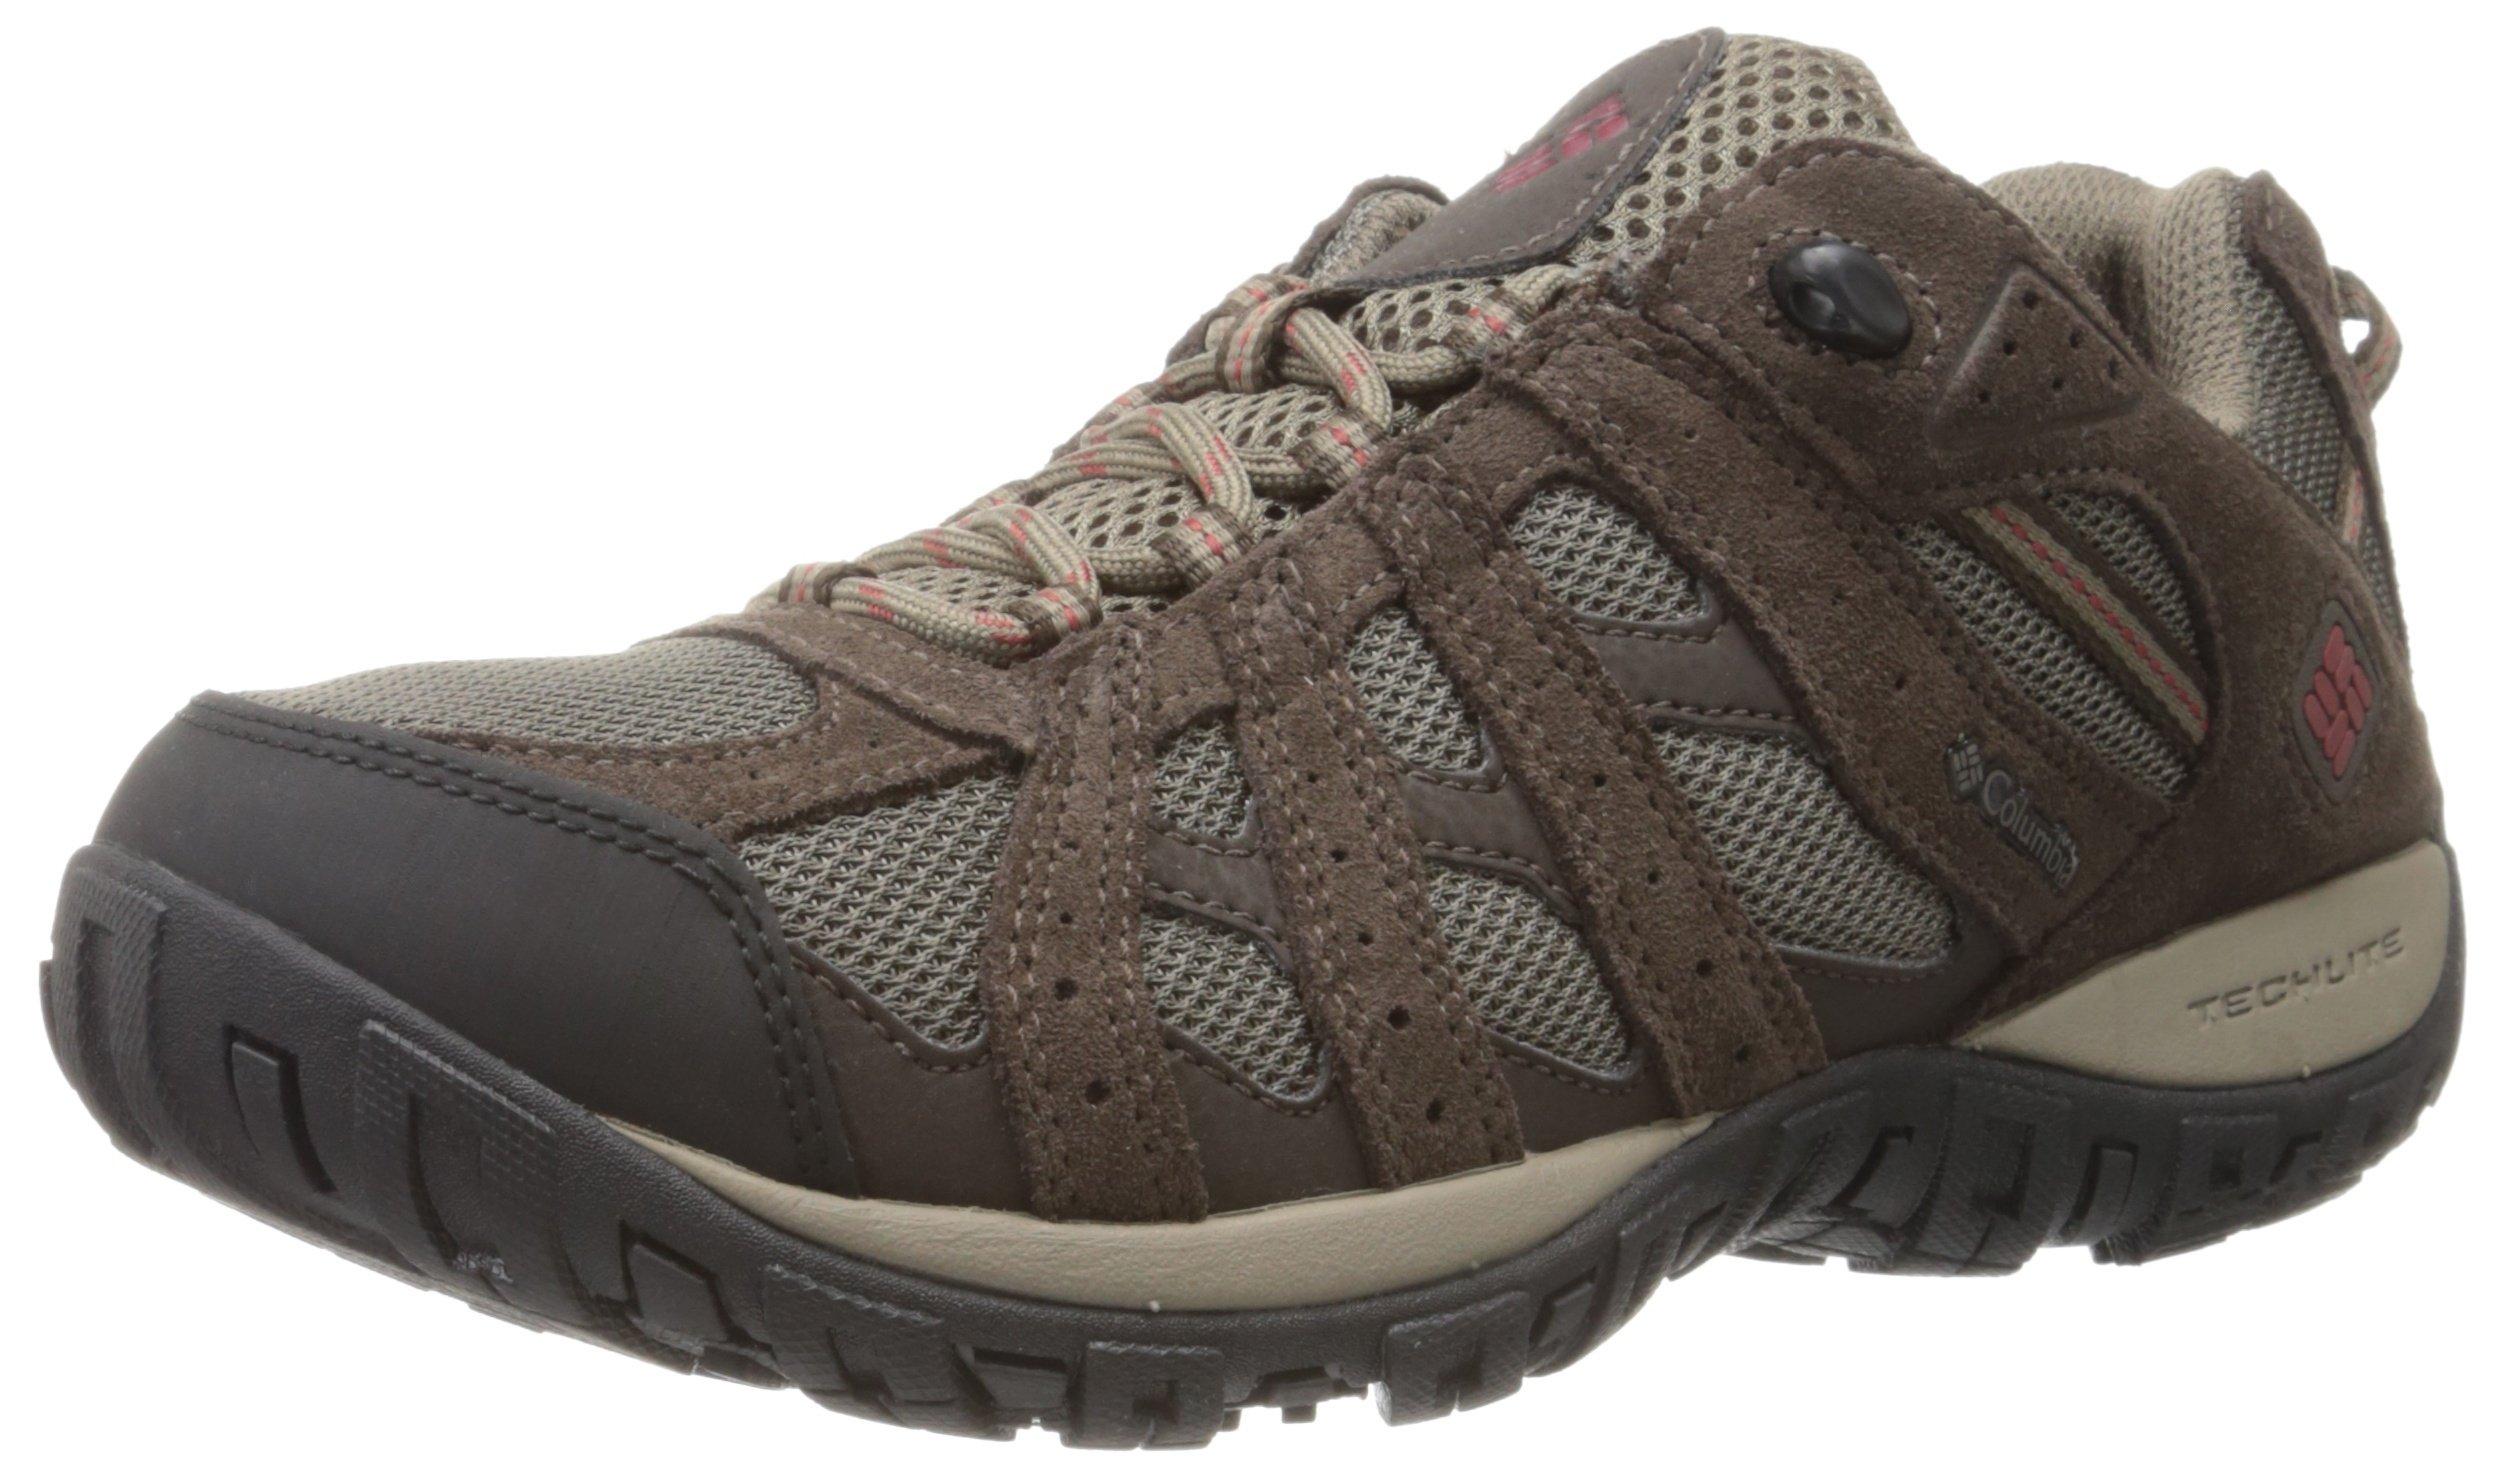 Columbia Men's Redmond Waterproof Hiking Shoe, Mud, Garnet Red, 10.5 D US